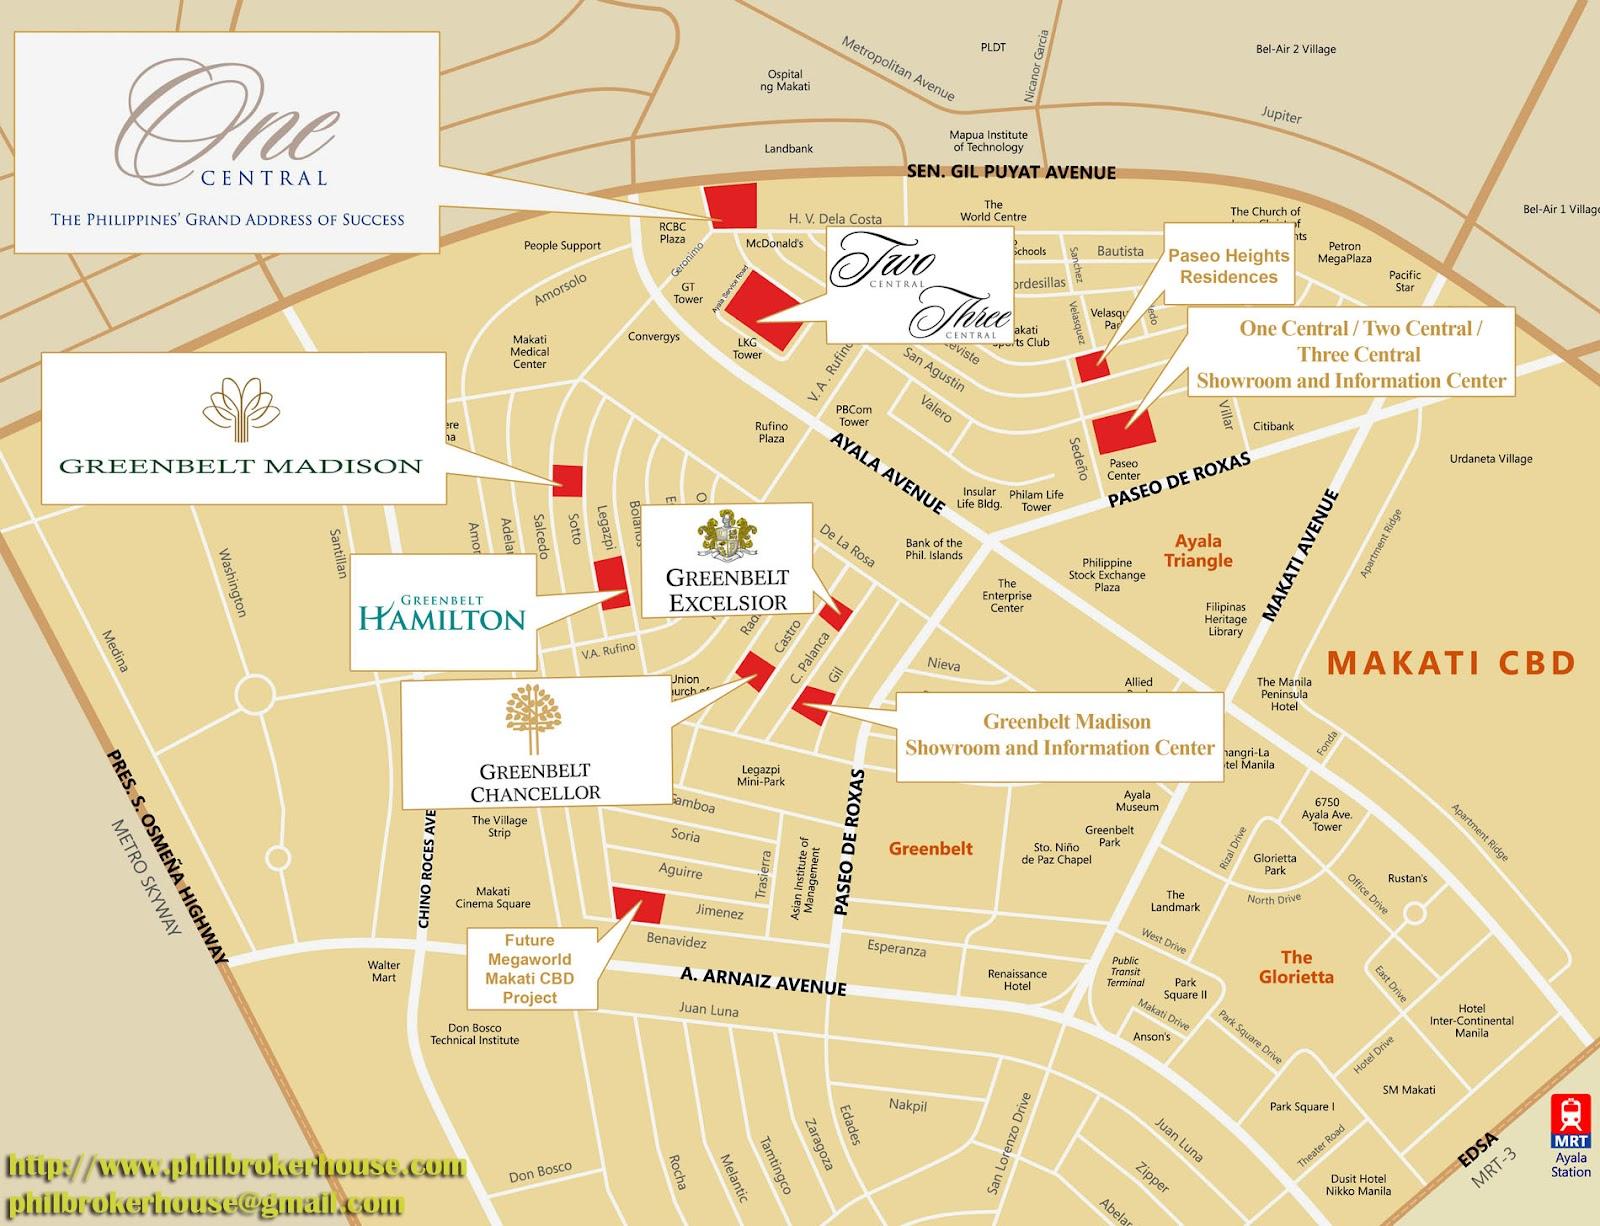 3 Bedroom Townhouse For Rent Philbrokerhouse Pre Selling Greenbelt Hamilton